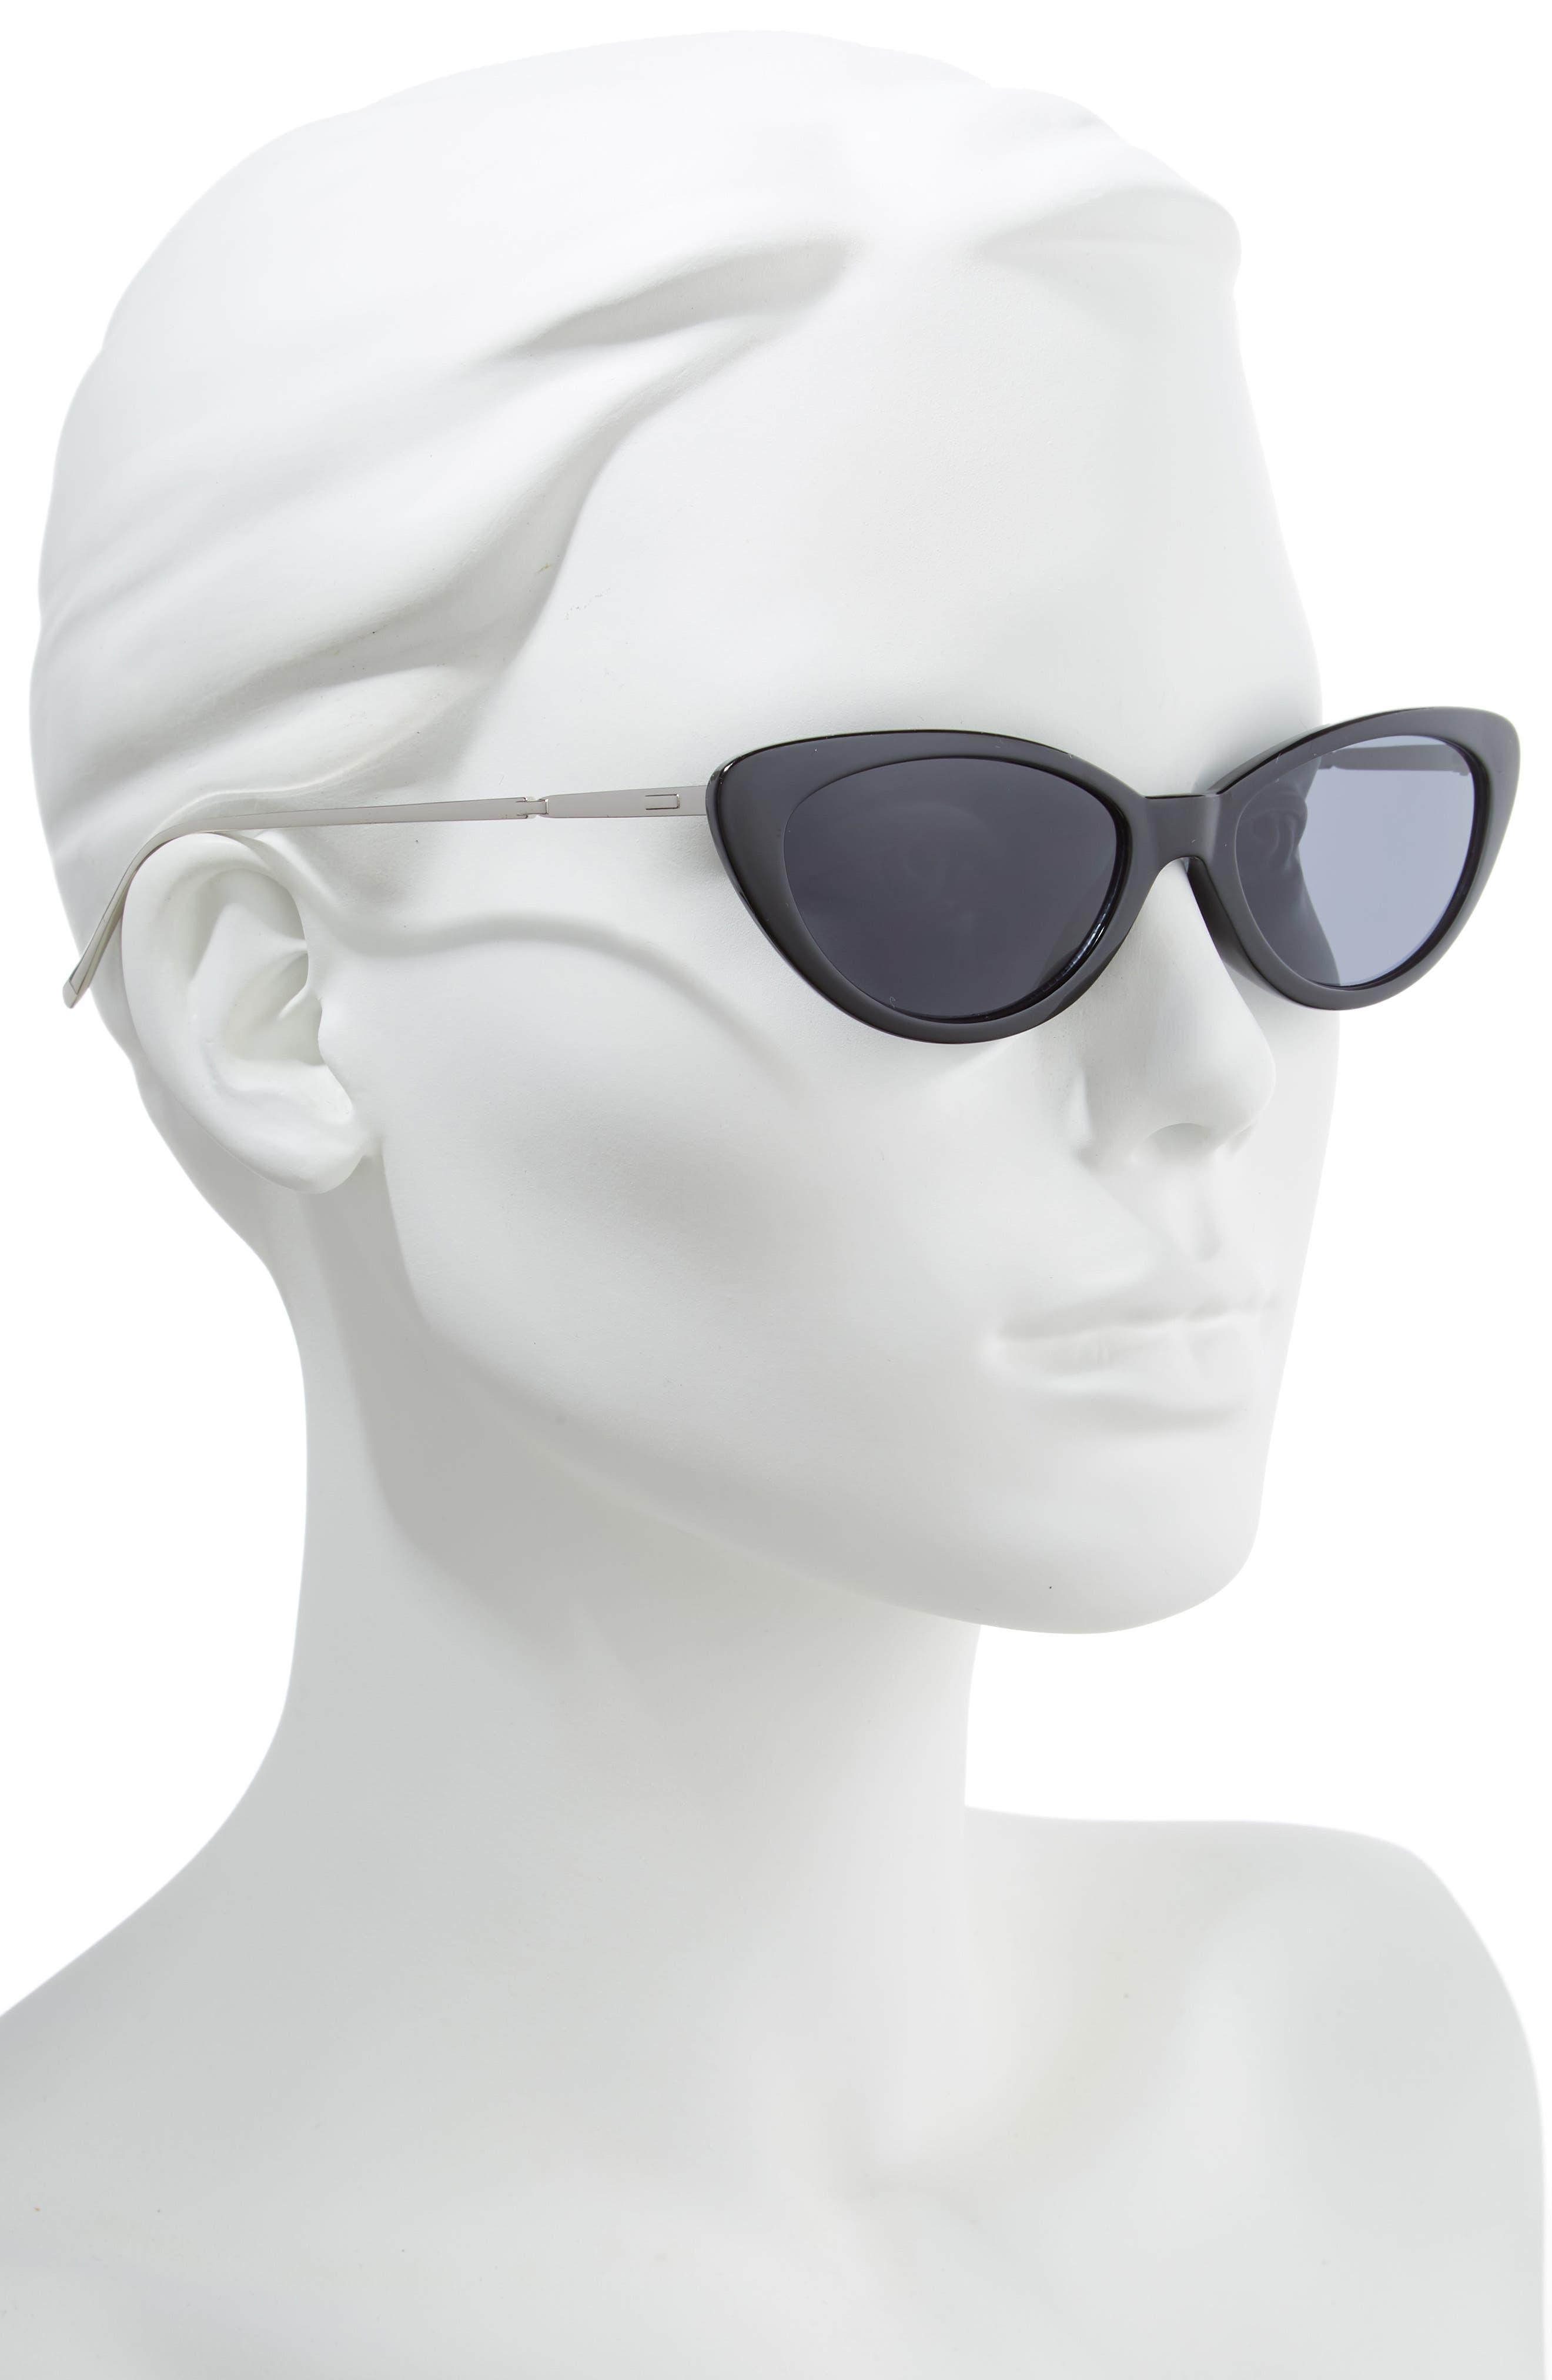 53mm Cat Eye Sunglasses,                             Alternate thumbnail 2, color,                             BLACK